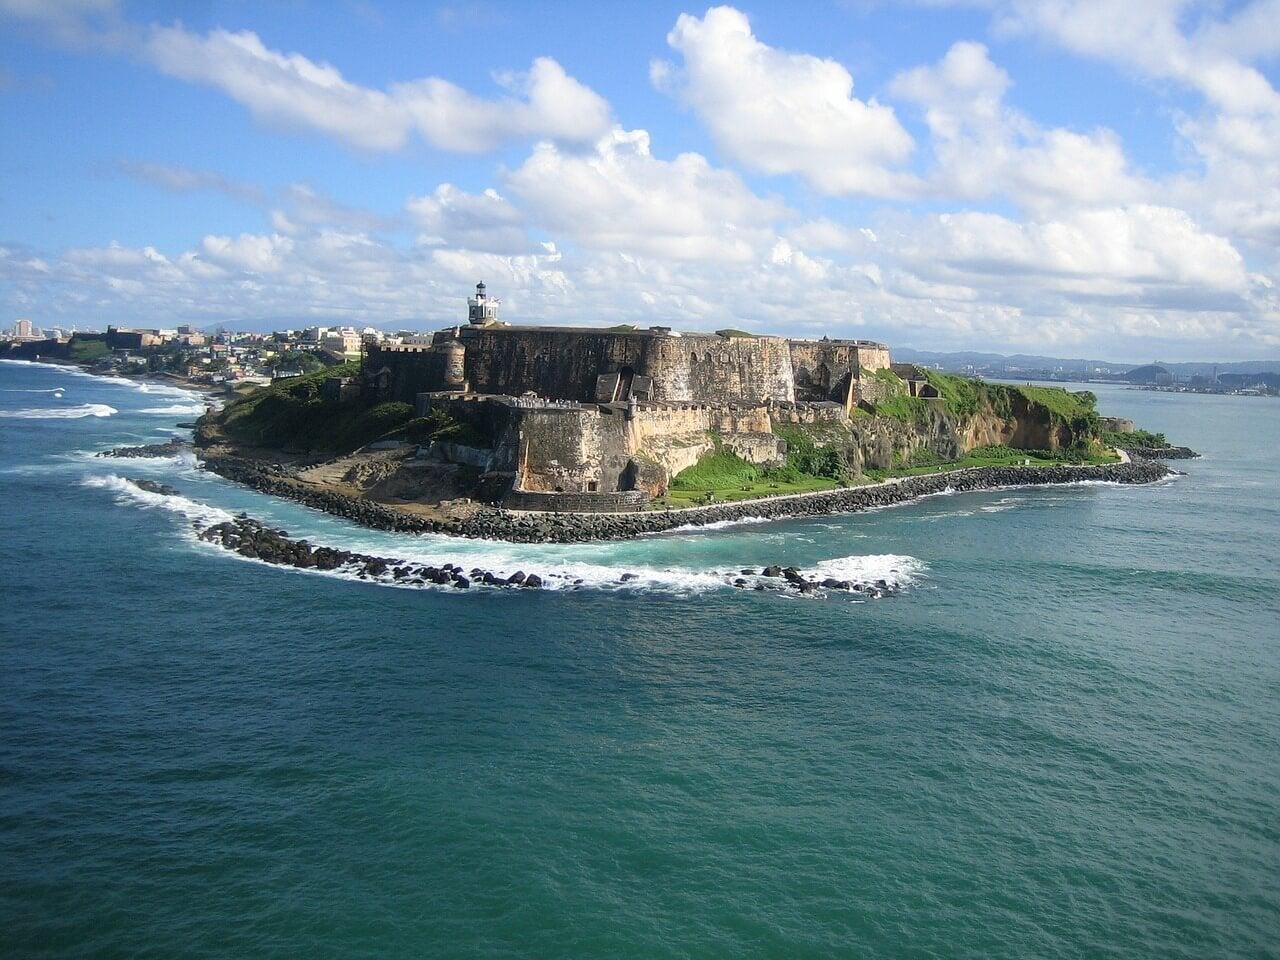 Vista del fuerte de San Felipe en San Juan